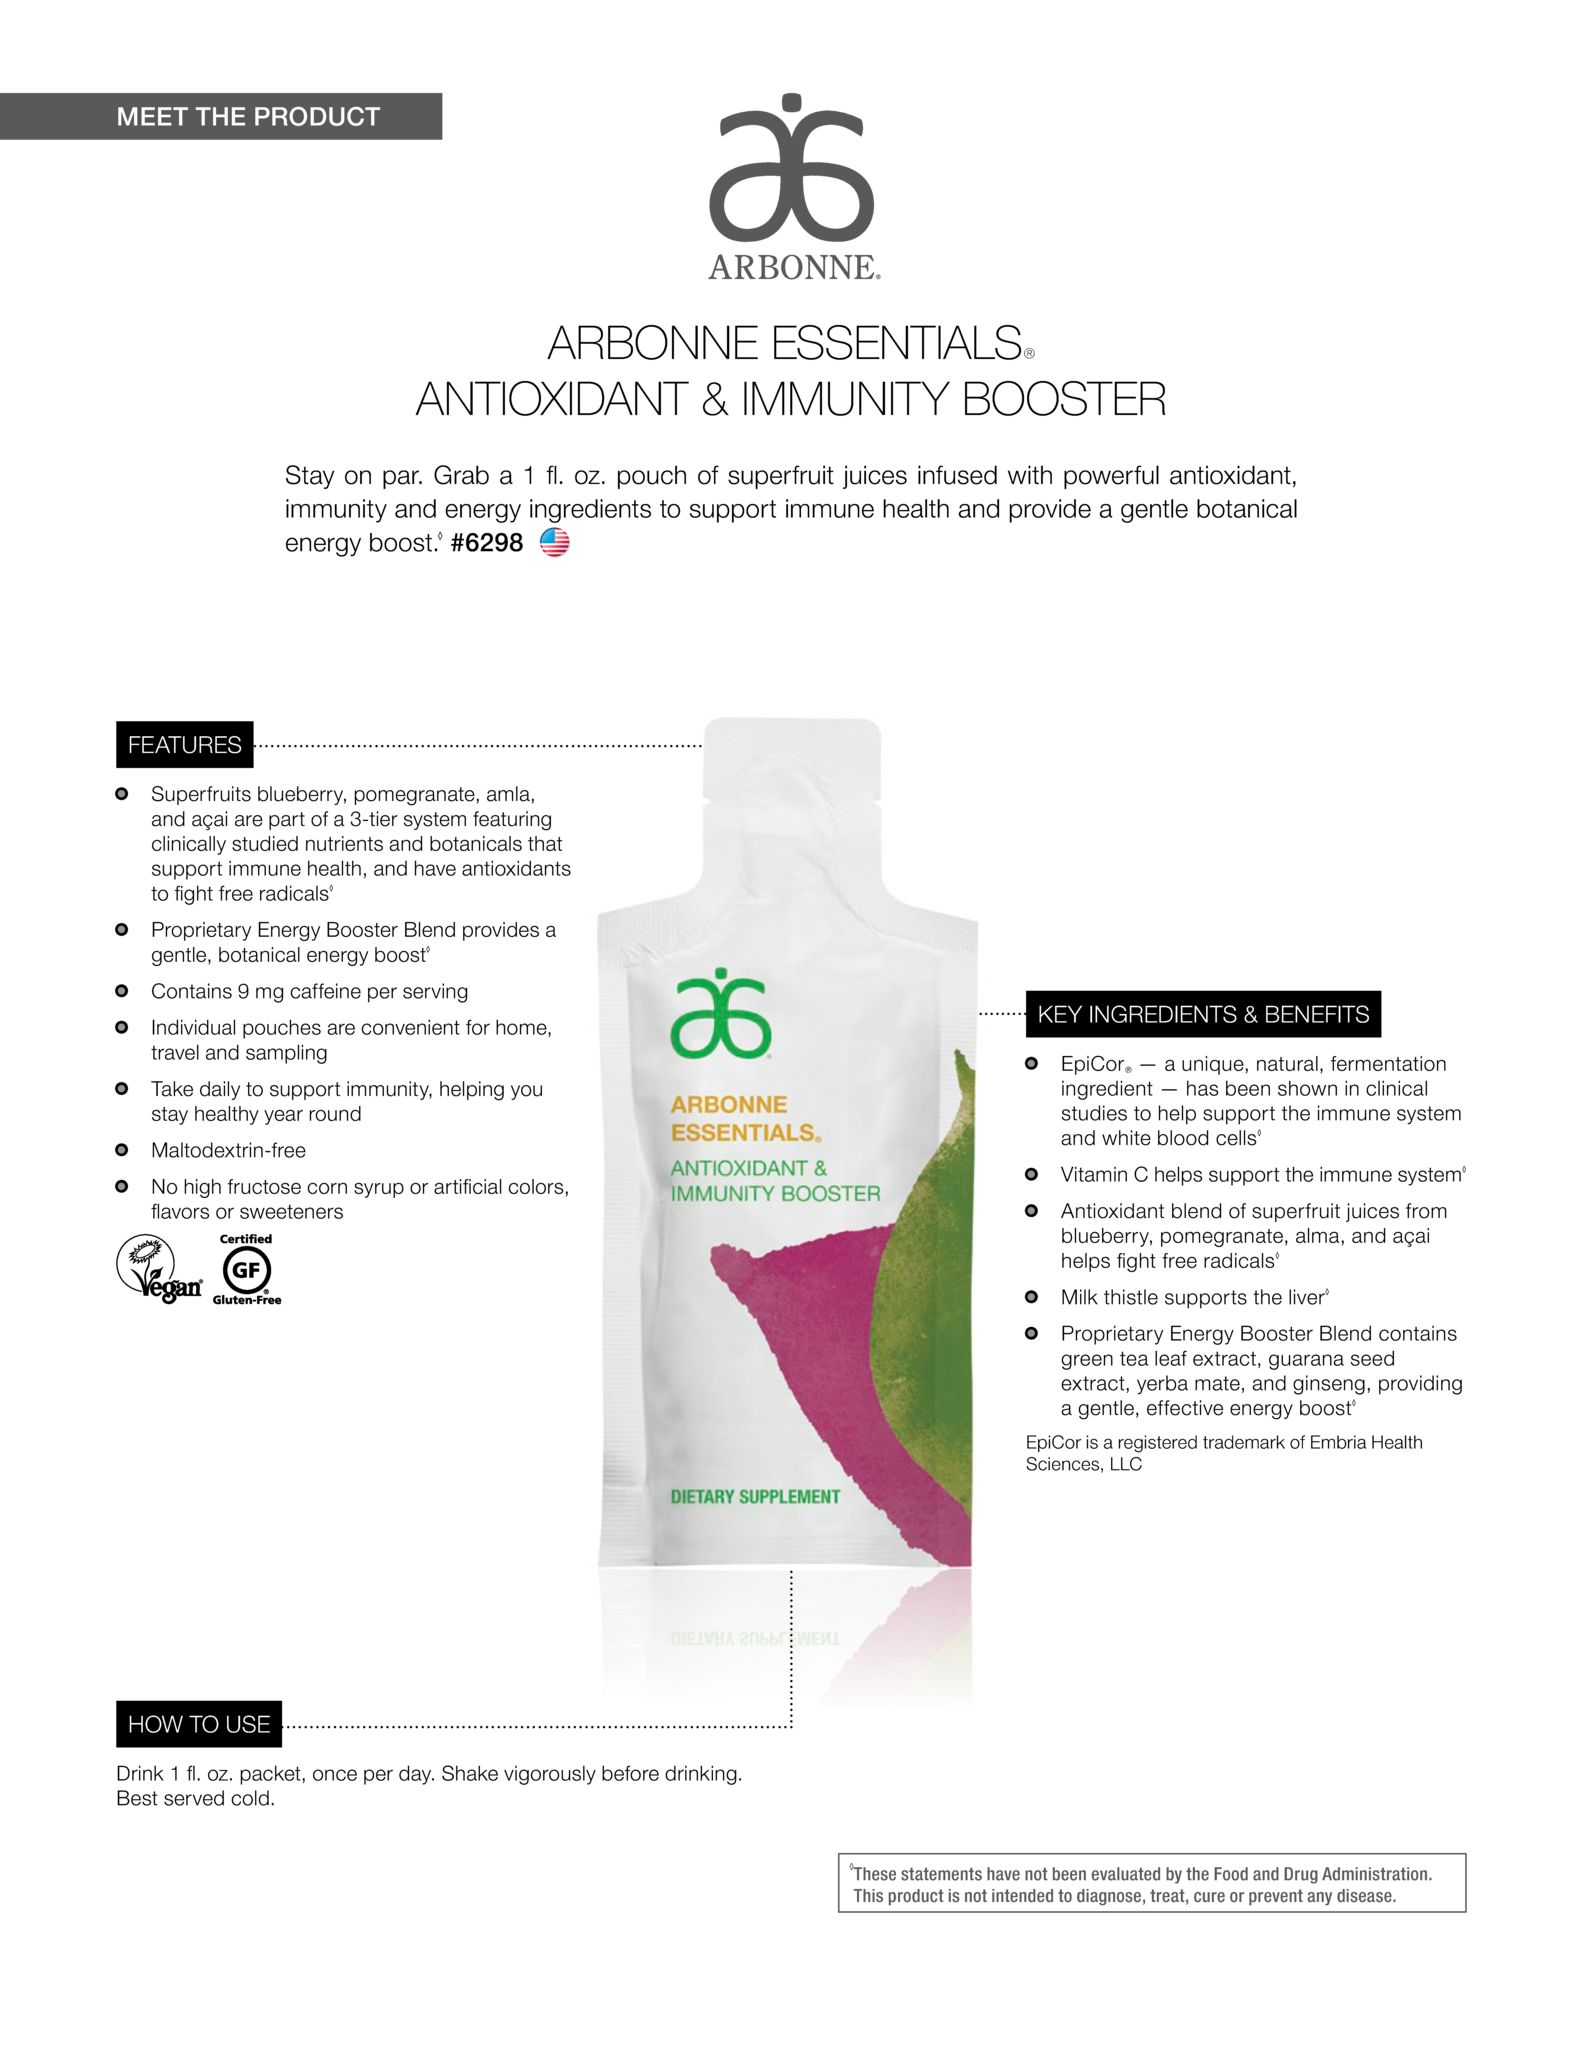 Pin By Ashley Maree On Arbonne Arbonne Arbonne Nutrition Arbonne 30 Day Challenge